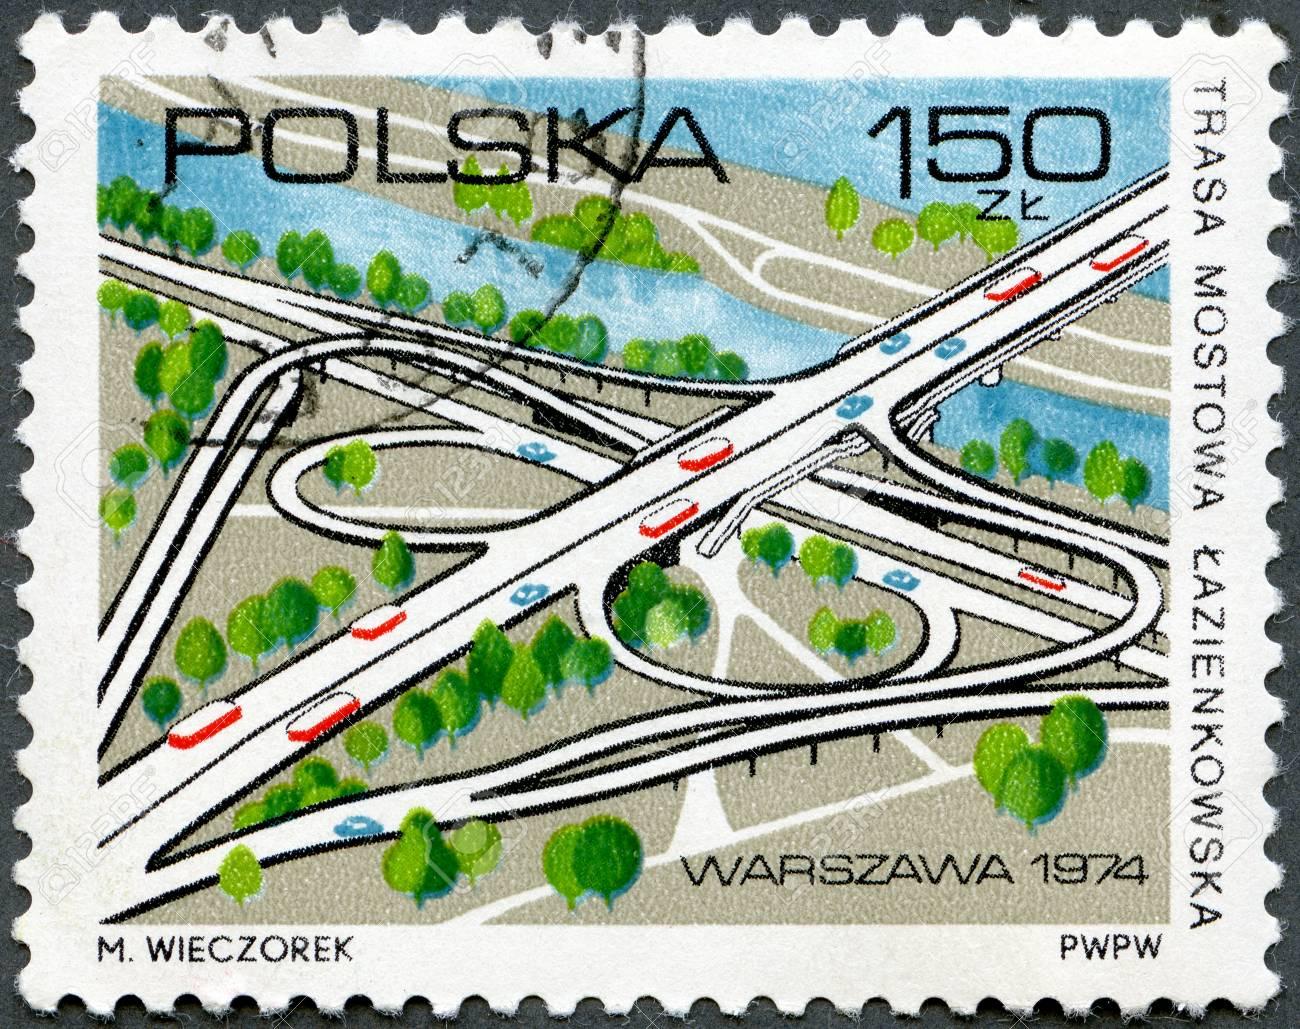 POLAND - CIRCA 1974: A stamp printed by Poland shows Lazienkowska Bridge Road, Opening of Lazienkowska Bridge over Vistula south of Warsaw, circa 1974 Stock Photo - 13023396